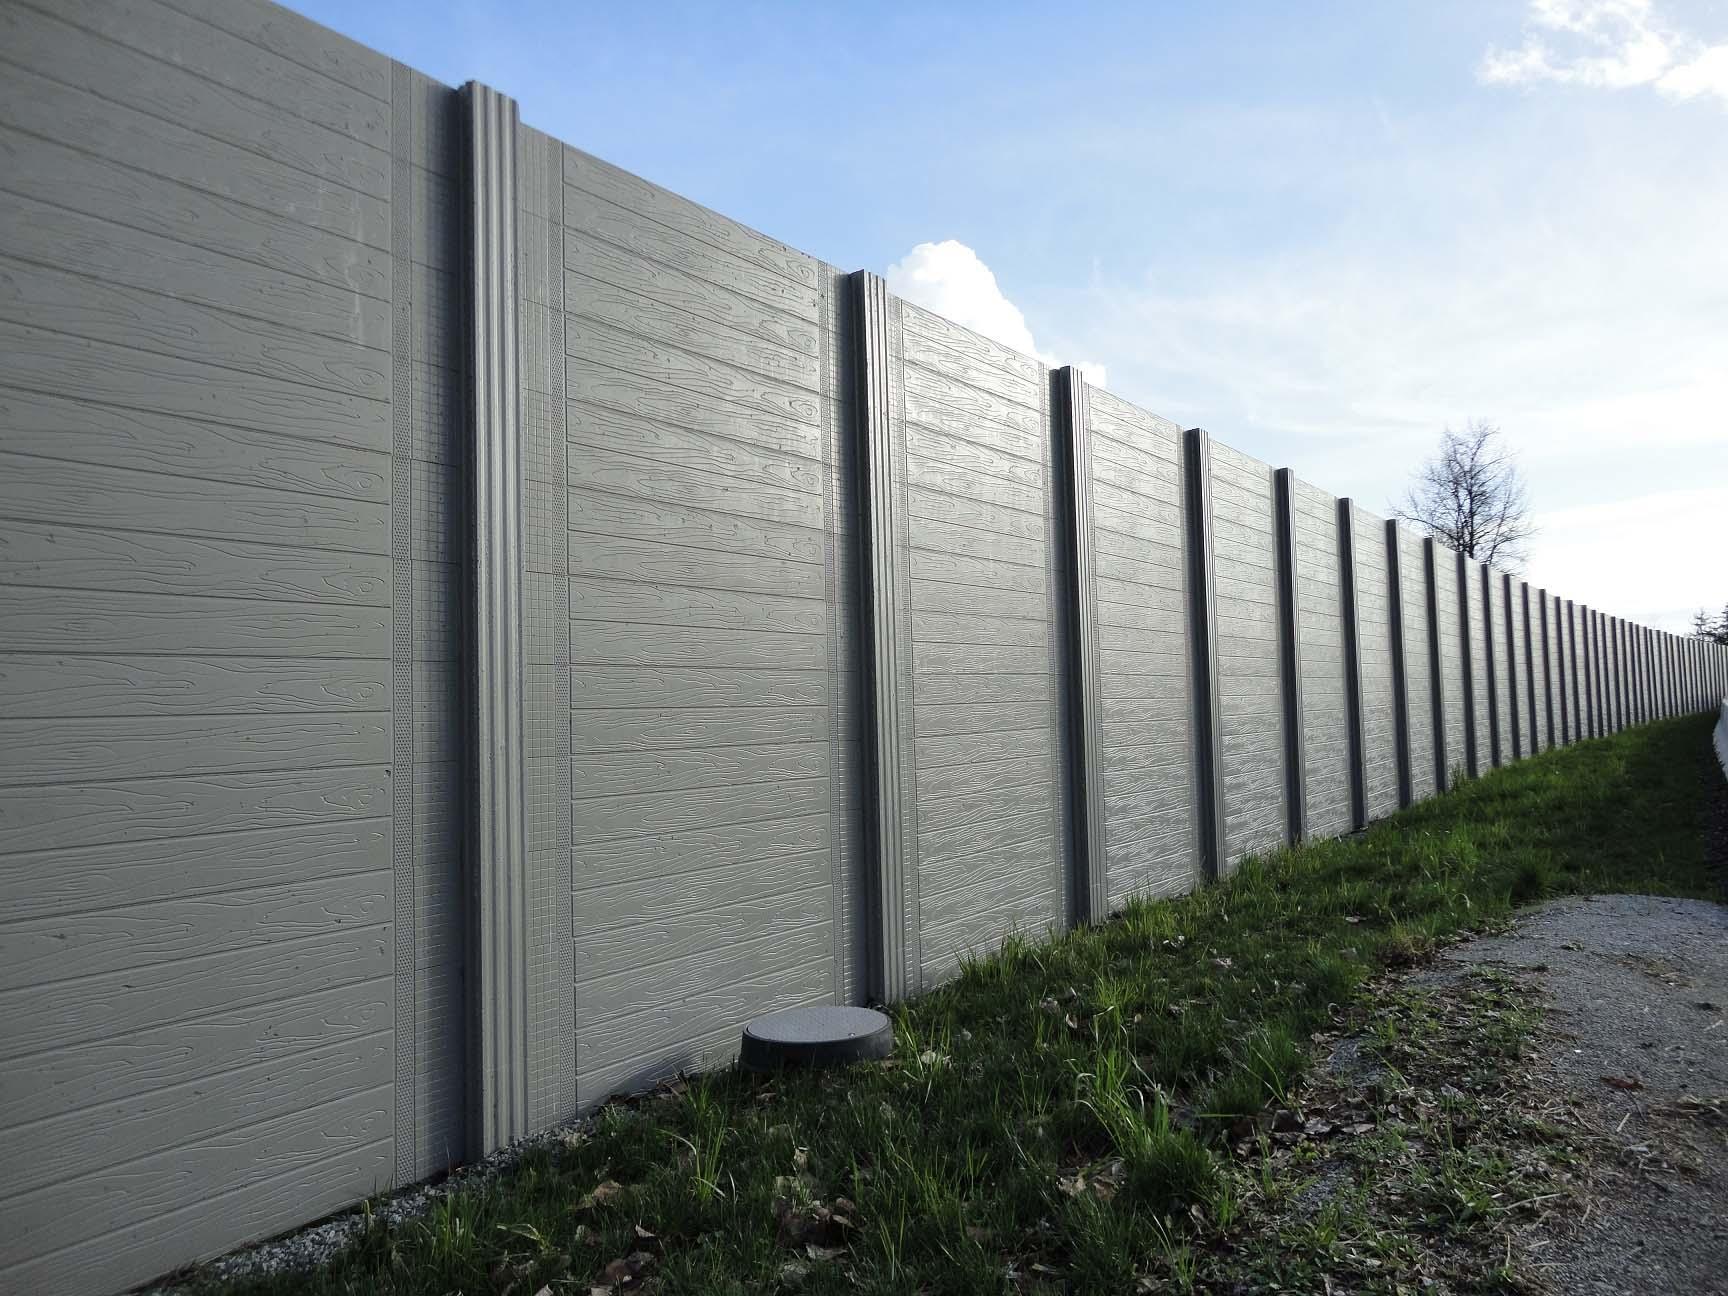 jenis pagar rumah beton